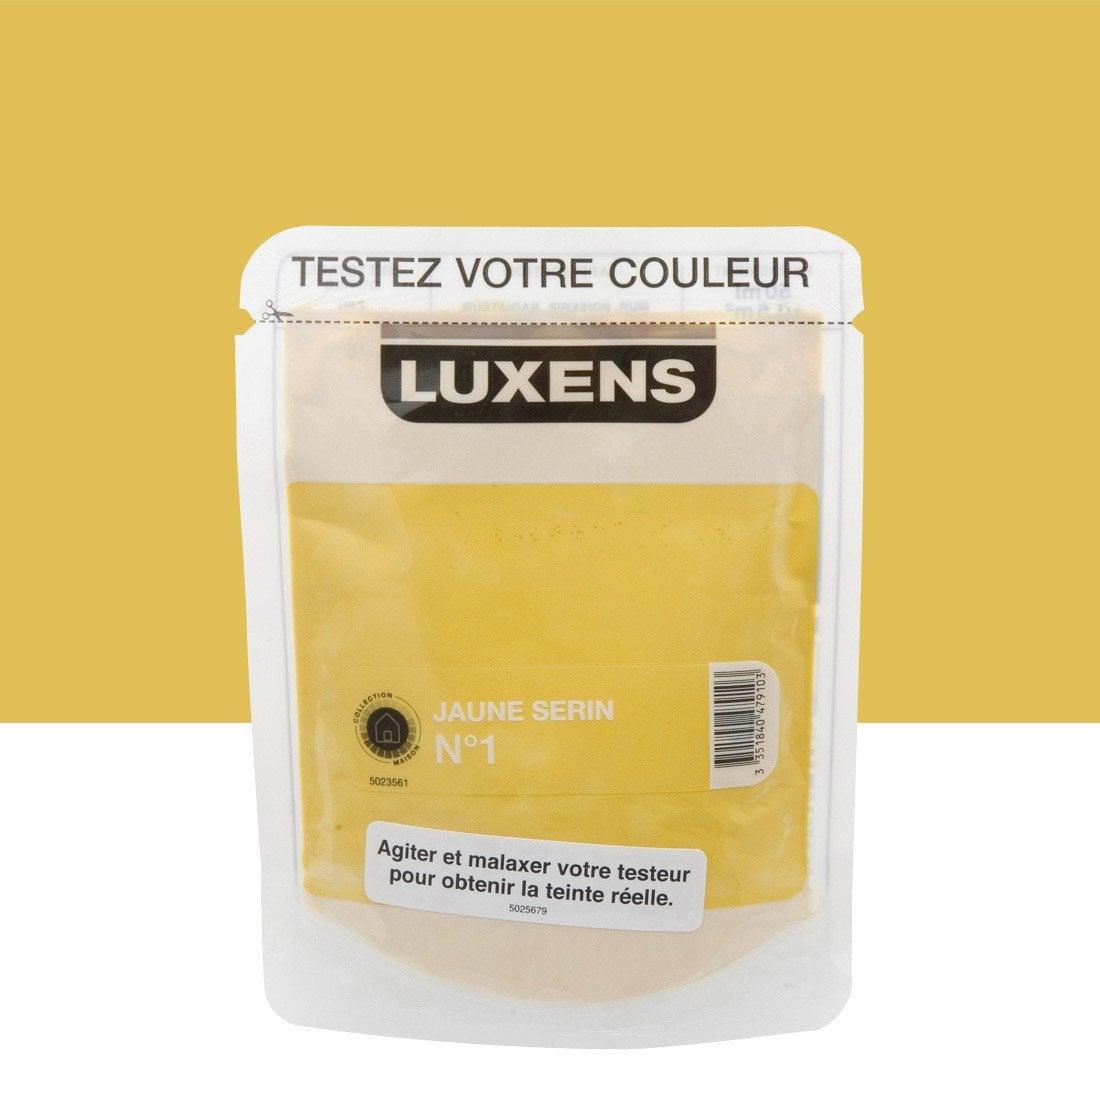 testeur peinture jaune serin 1 luxens couleurs int rieures satin l leroy merlin. Black Bedroom Furniture Sets. Home Design Ideas